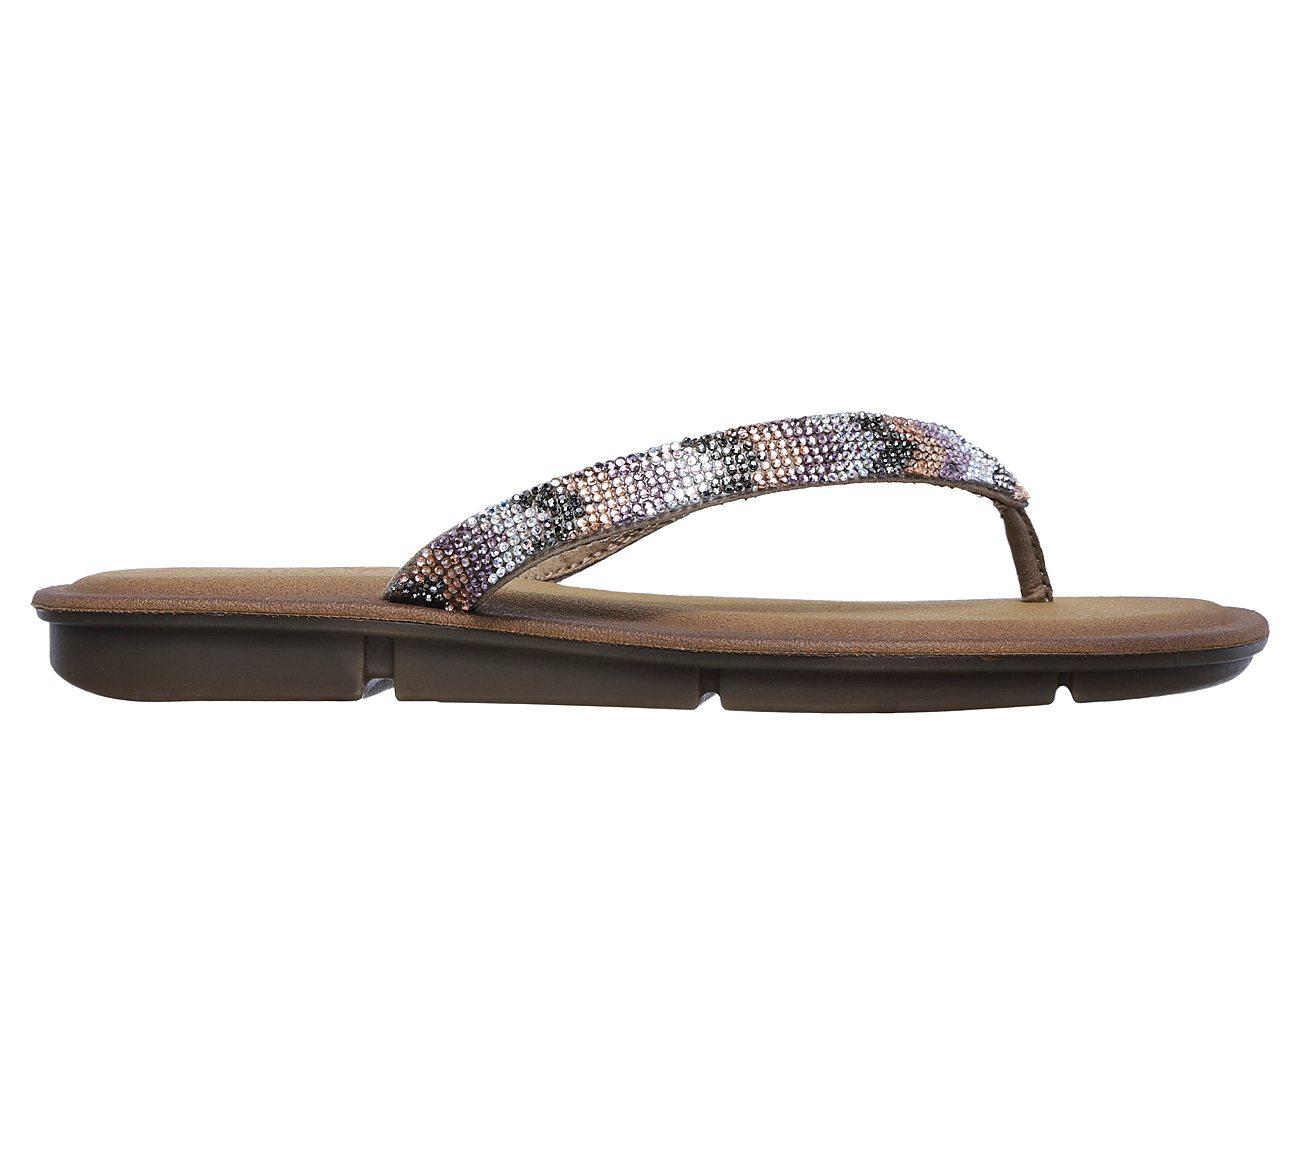 b09242f9ac0062 Buy SKECHERS Indulge 2 - Glitz and Glam Cali Shoes only  45.00